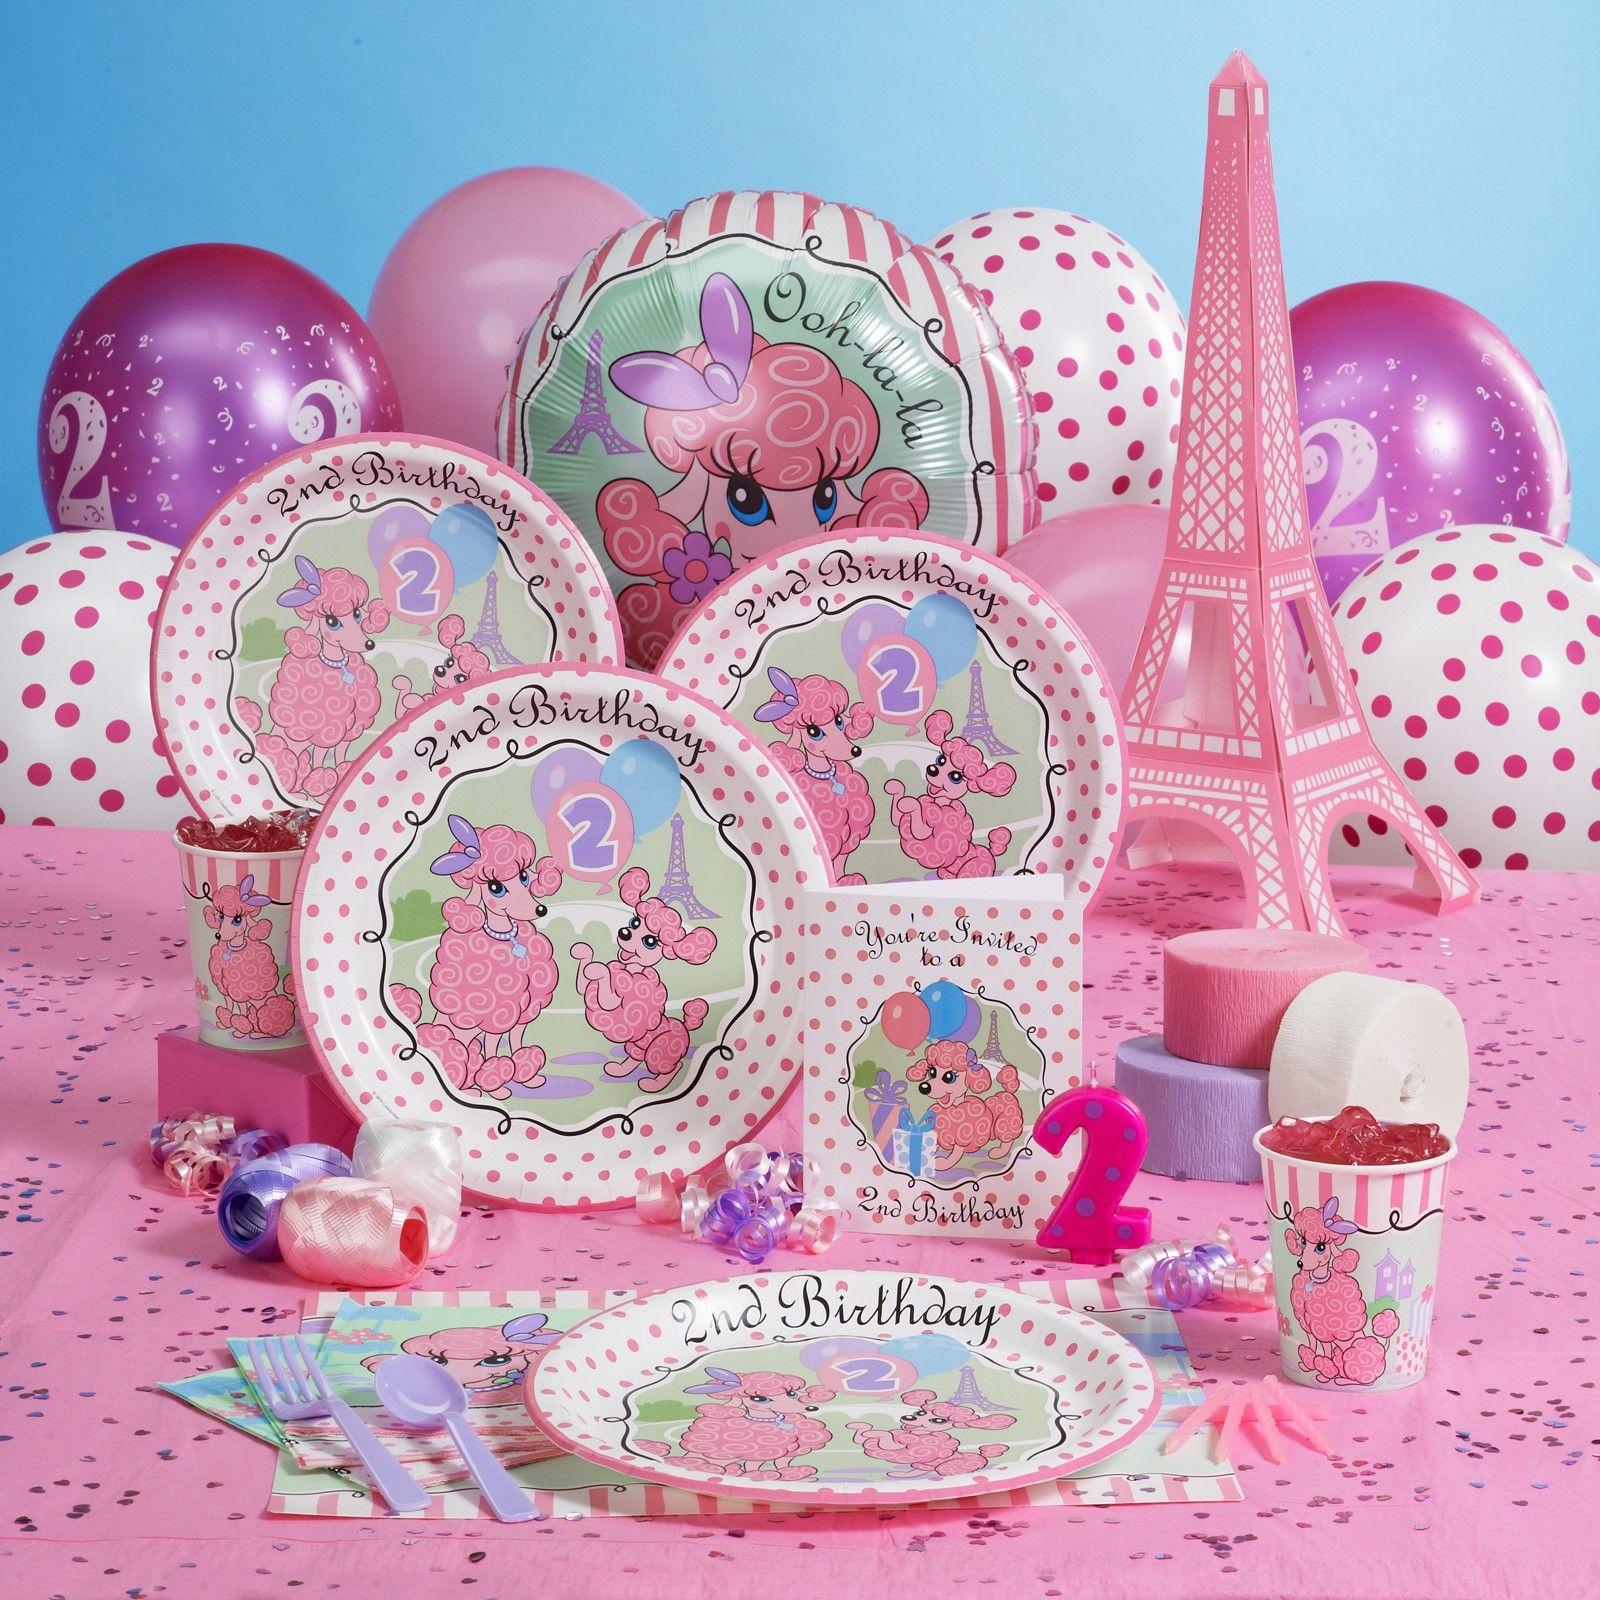 Little+girl+birthday+party+ideas